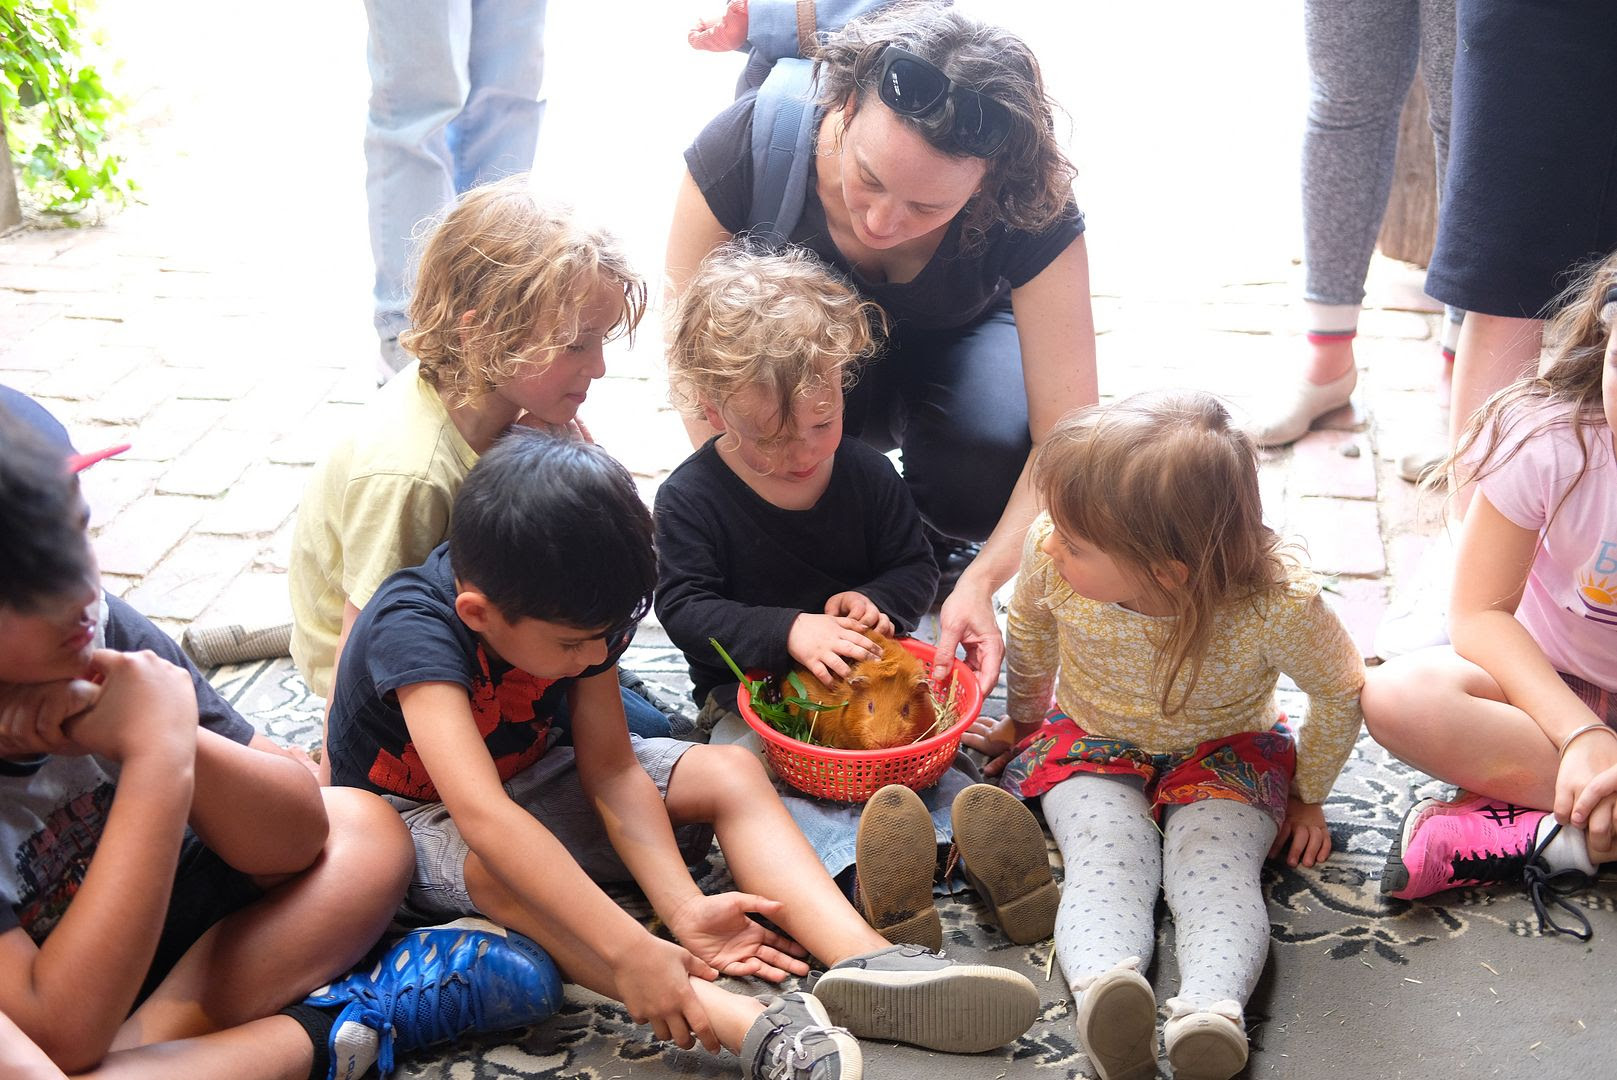 photo Collingwood Childrens Farm 7.jpg